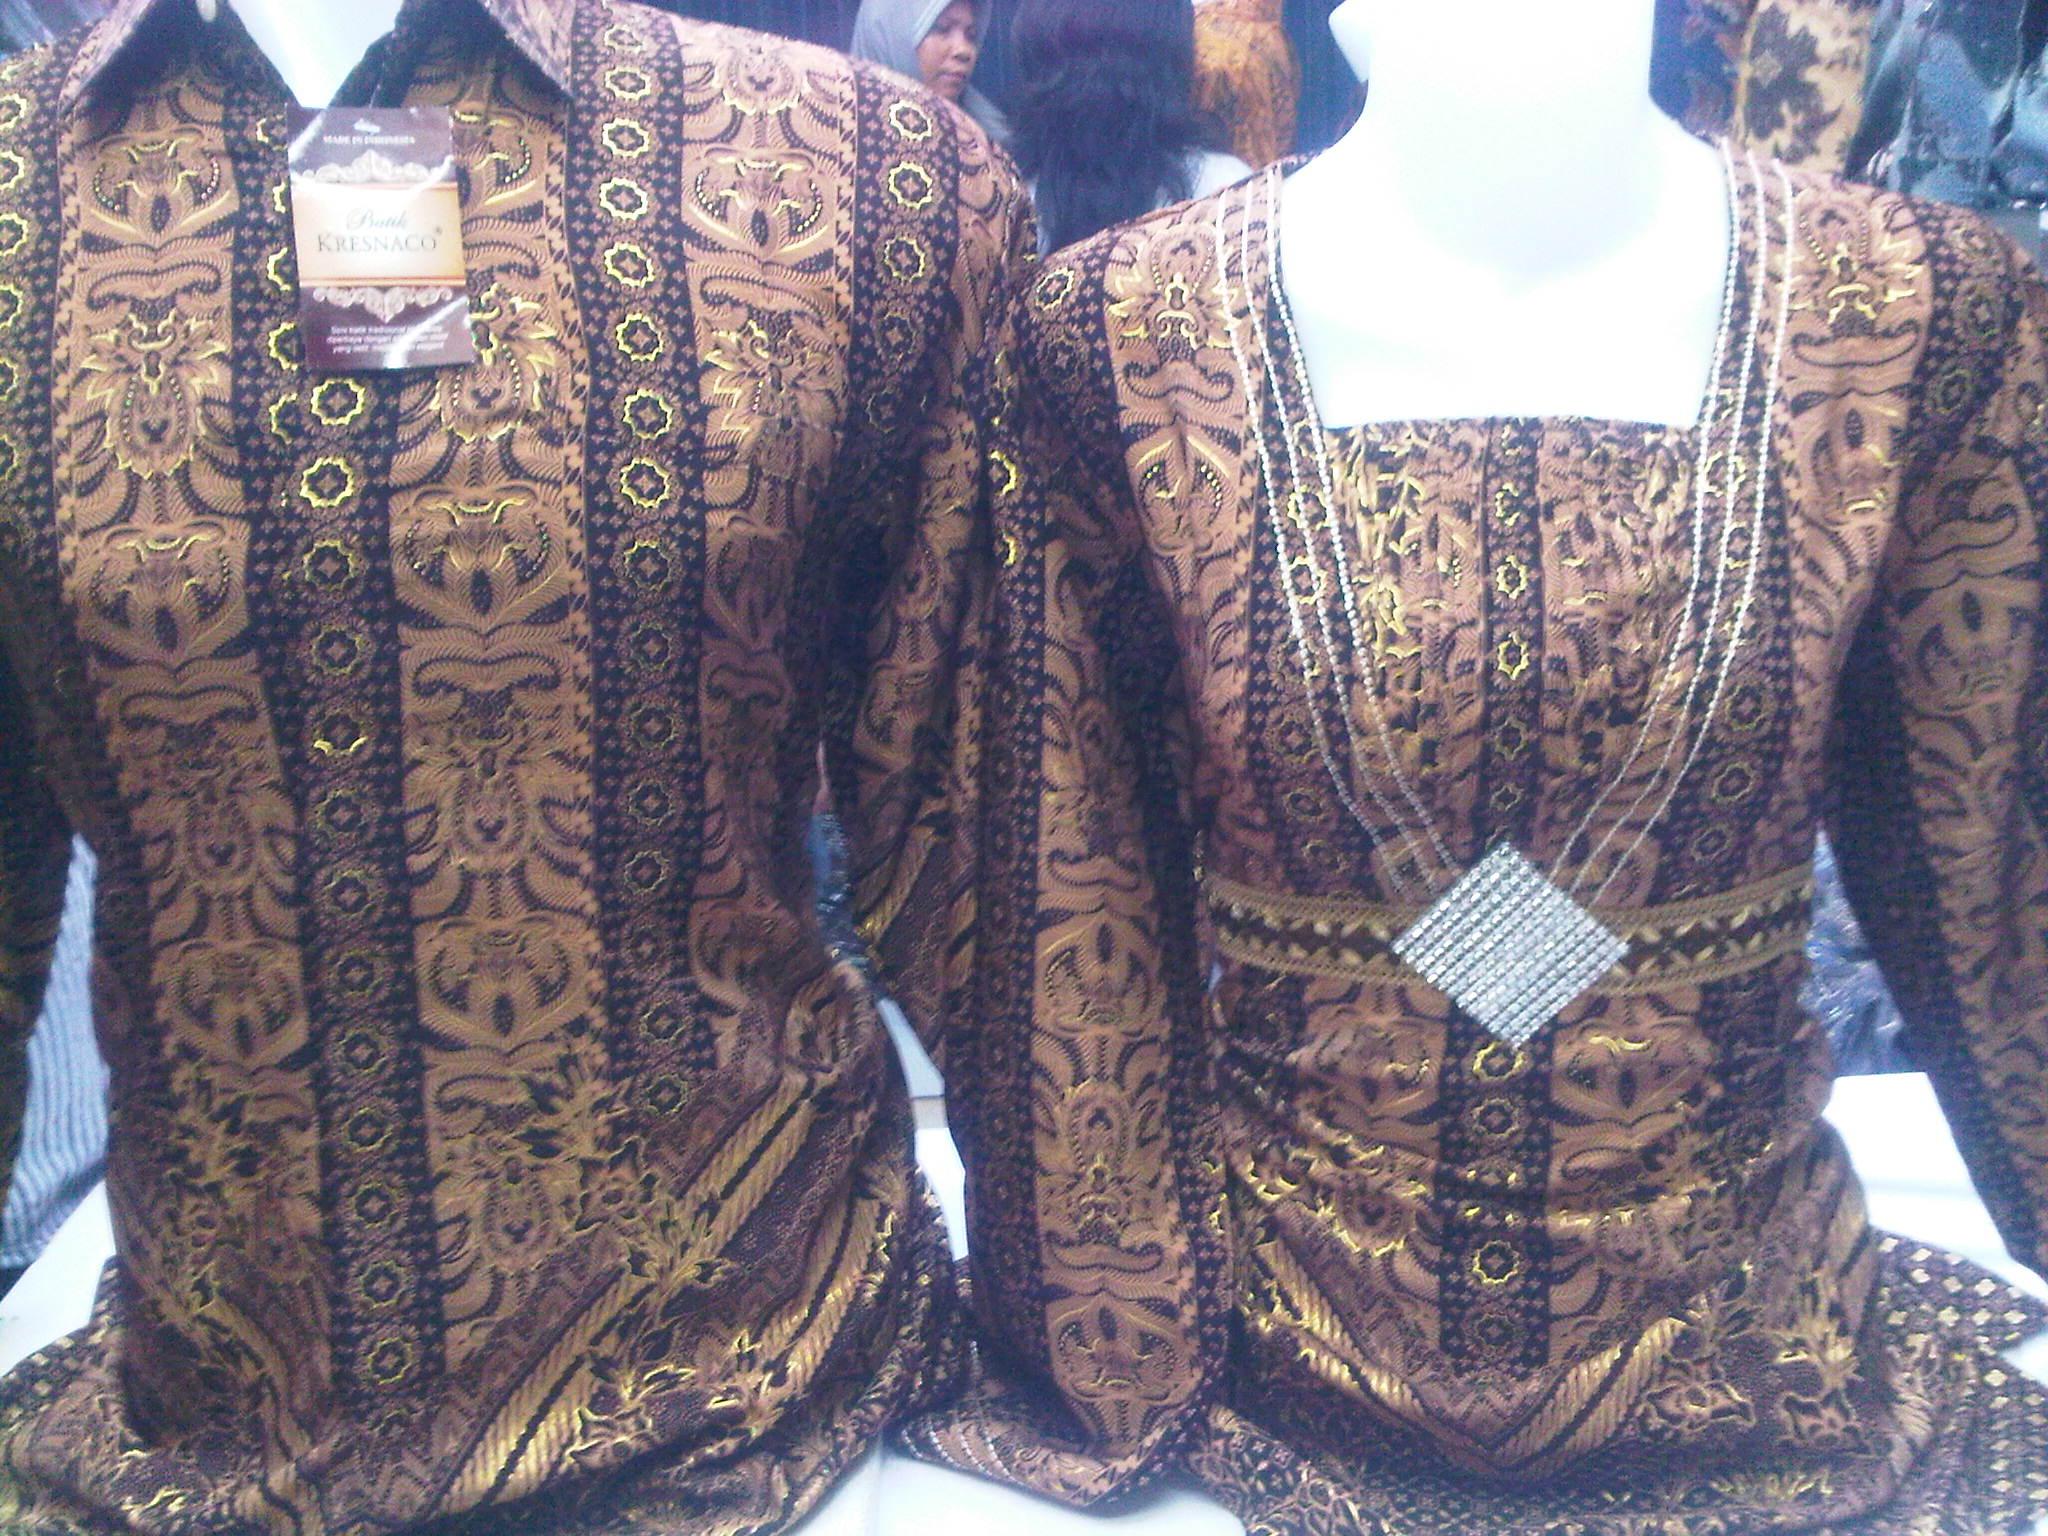 This Image was ranked 2 by Bing.com for keyword batik keris online ...